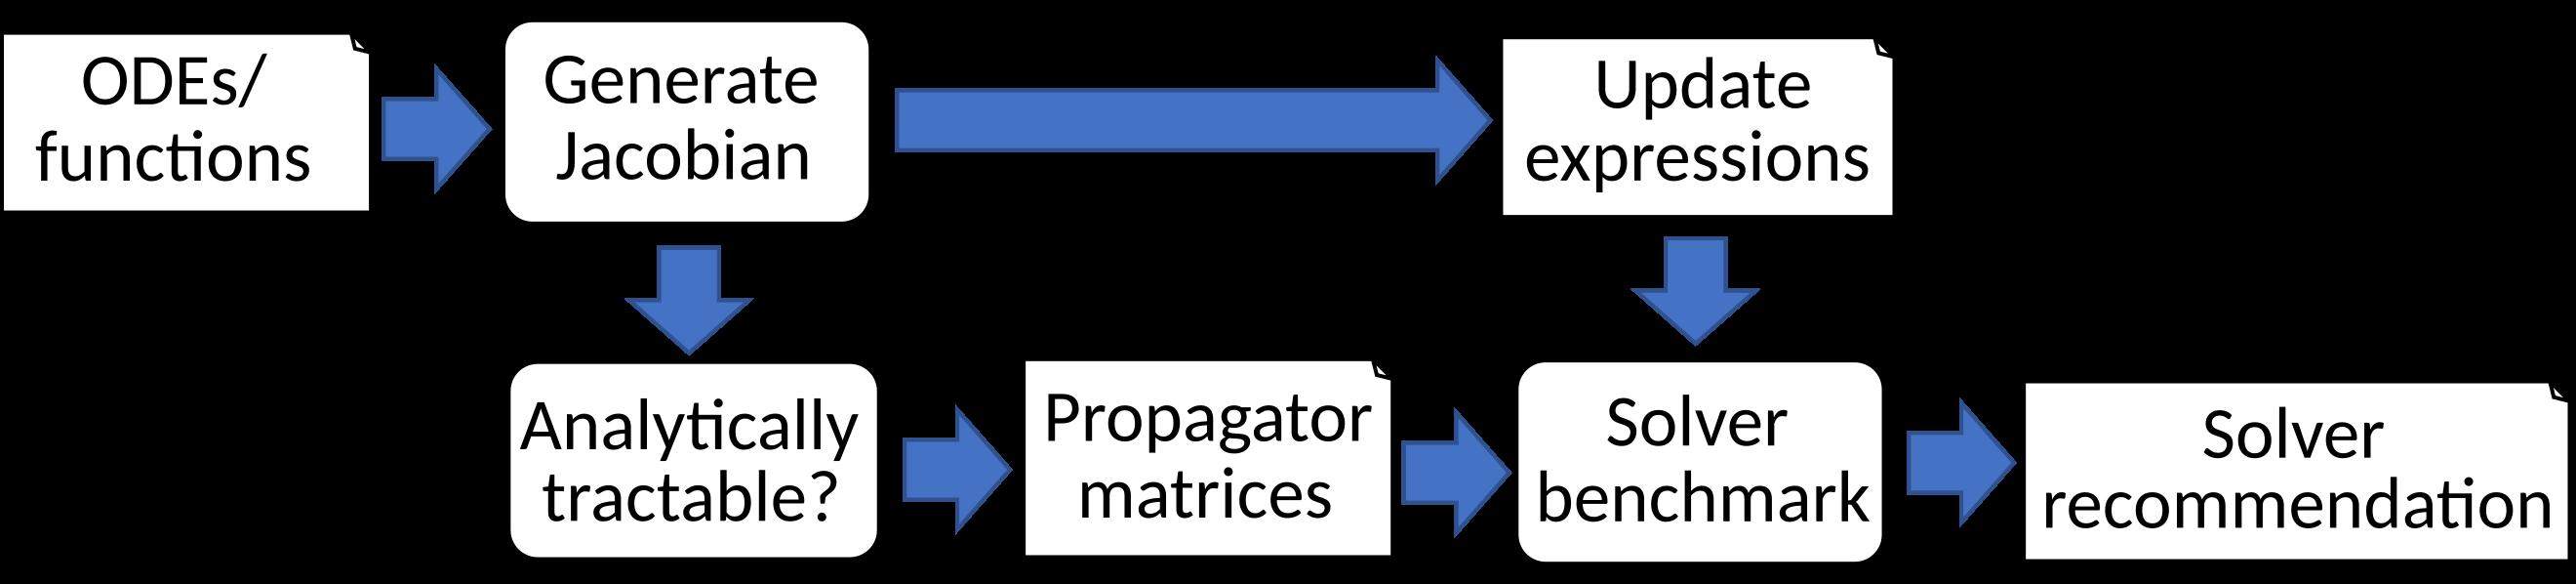 Detailed flow diagram